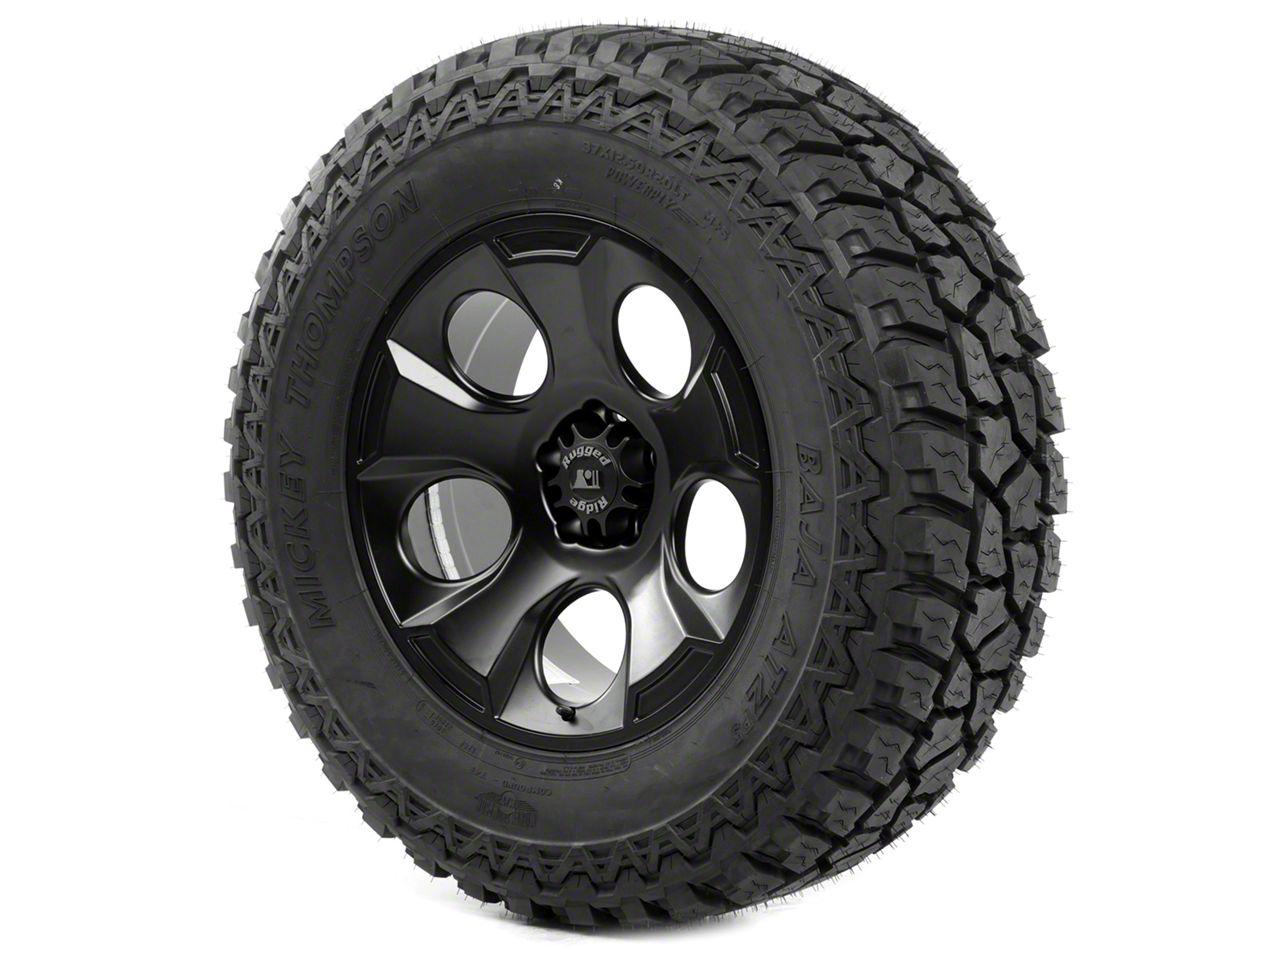 Rugged Ridge Drakon Wheel 20x9 Black Satin and Mickey Thompson ATZ P3 37x12.50x20 Tire Kit (13-18 Jeep Wrangler JK; 2018 Jeep Wrangler JL)